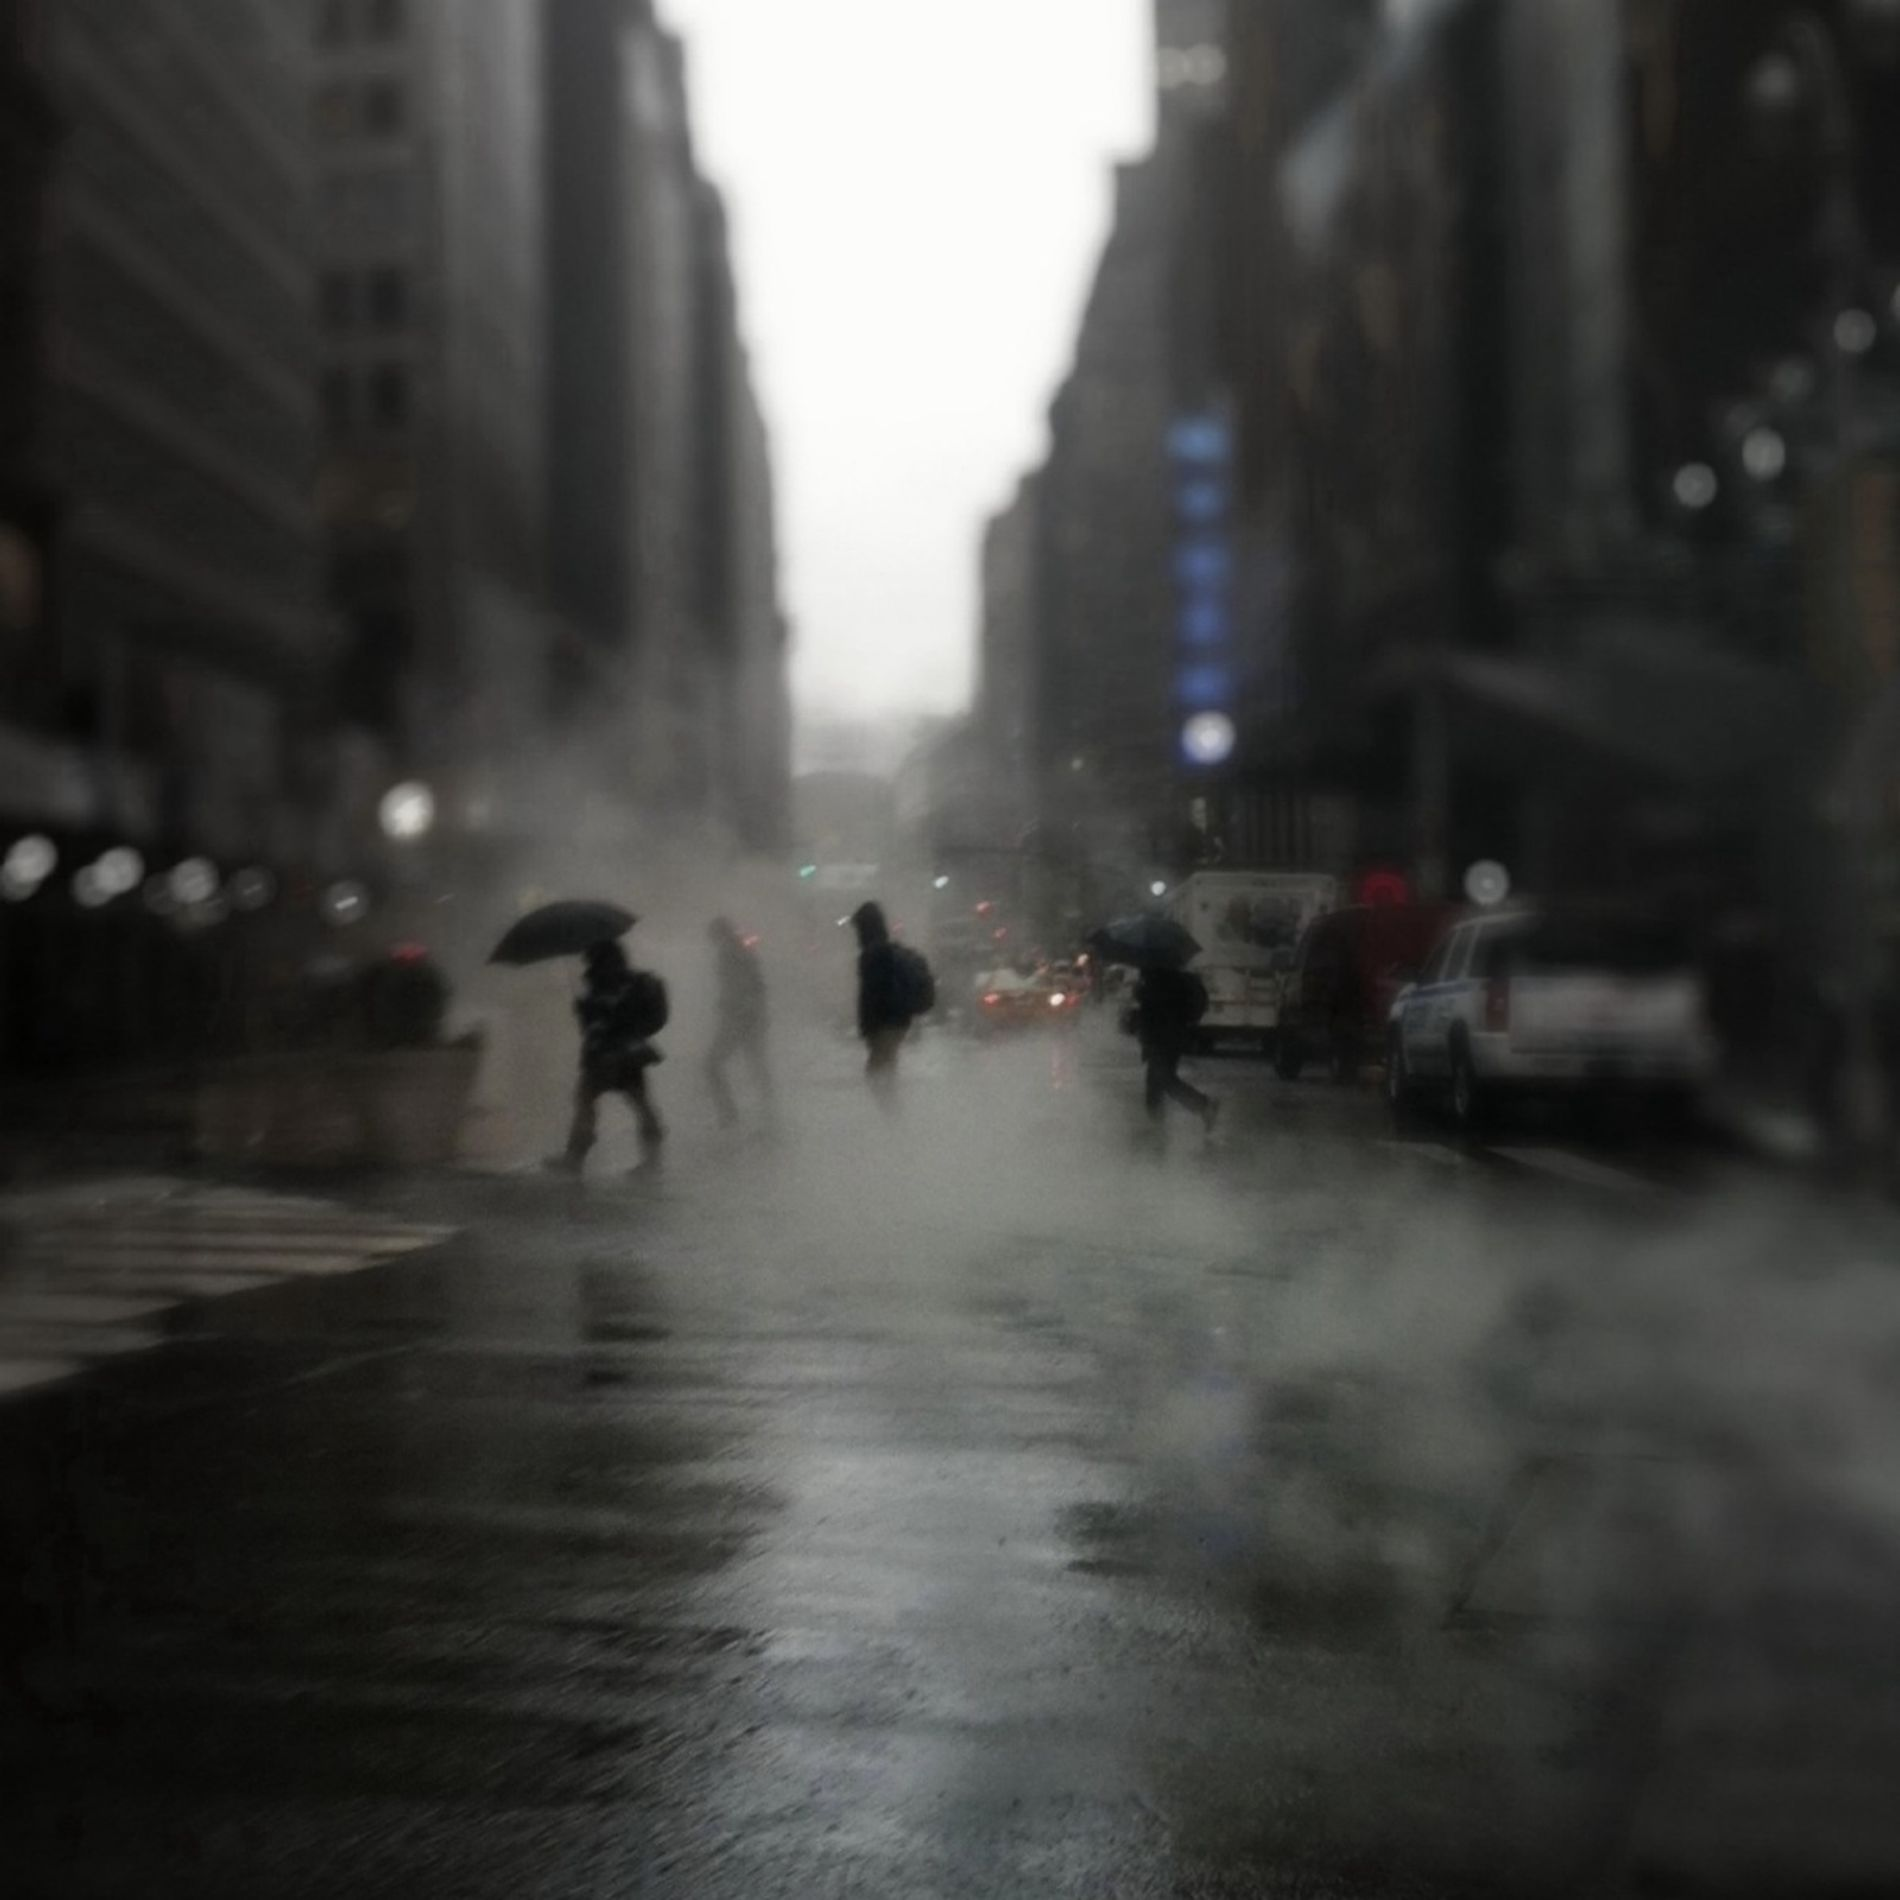 Streetphotography Keep It Blurry